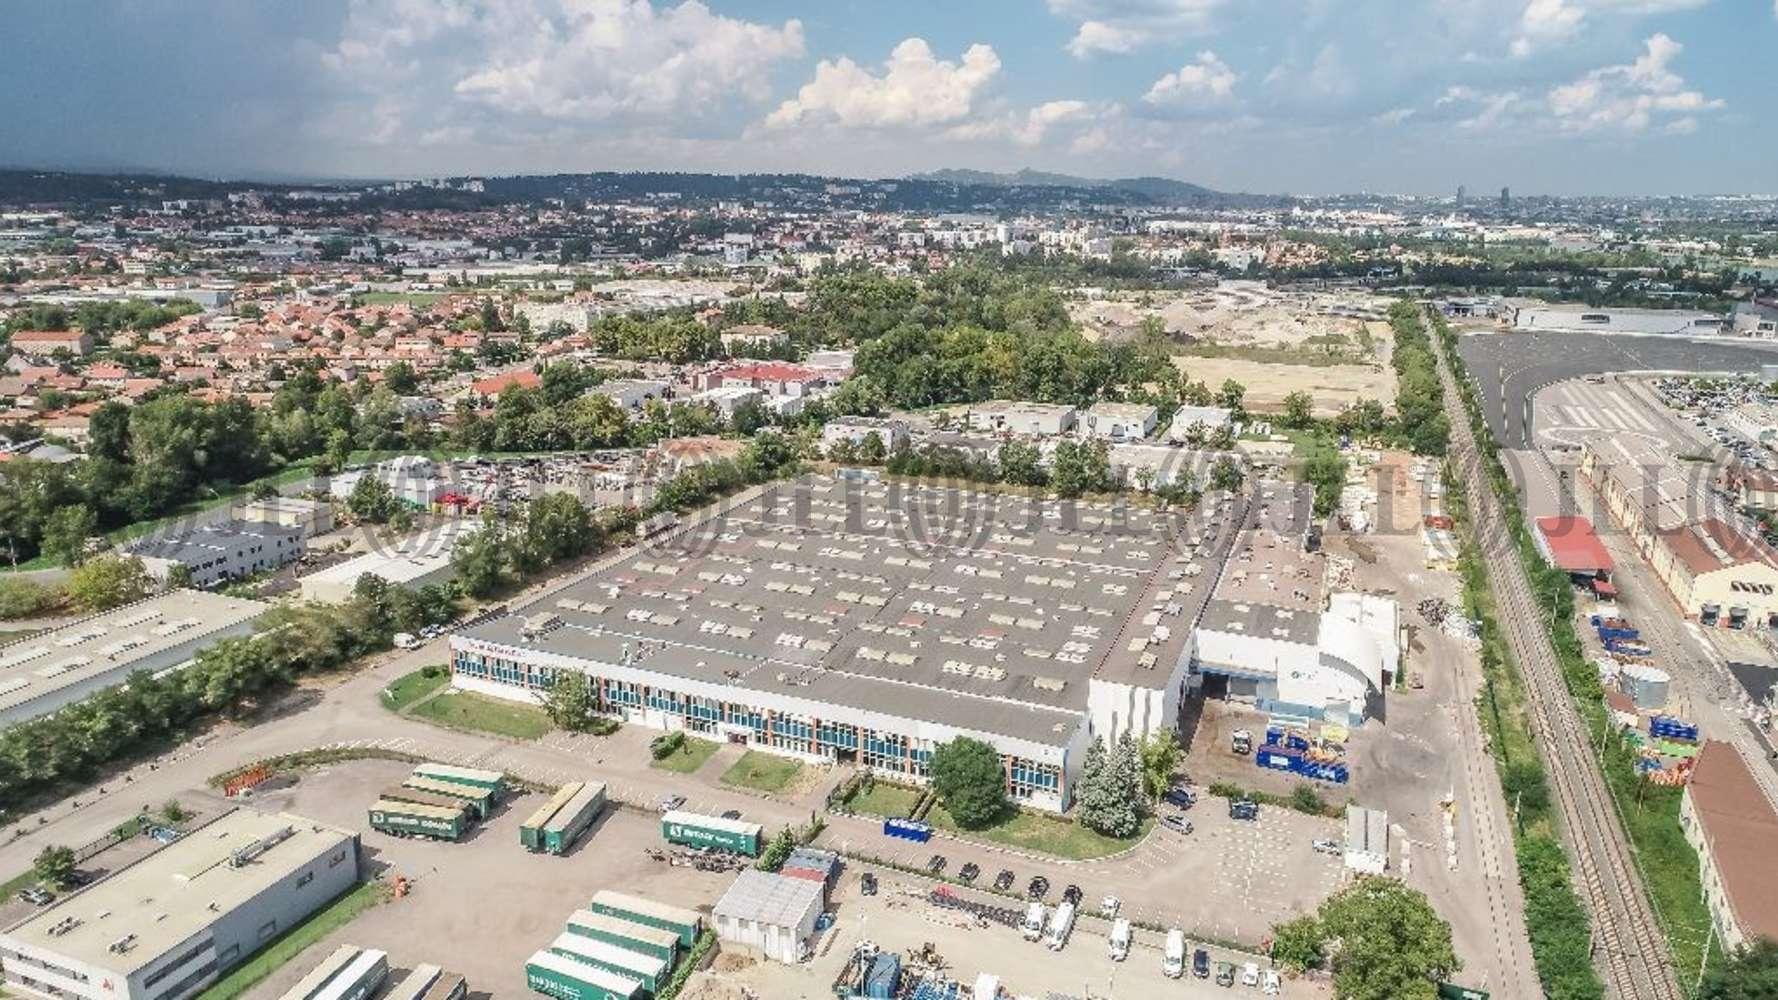 Plateformes logistiques Irigny, 69540 - Entrepot à vendre Lyon Sud - Irigny